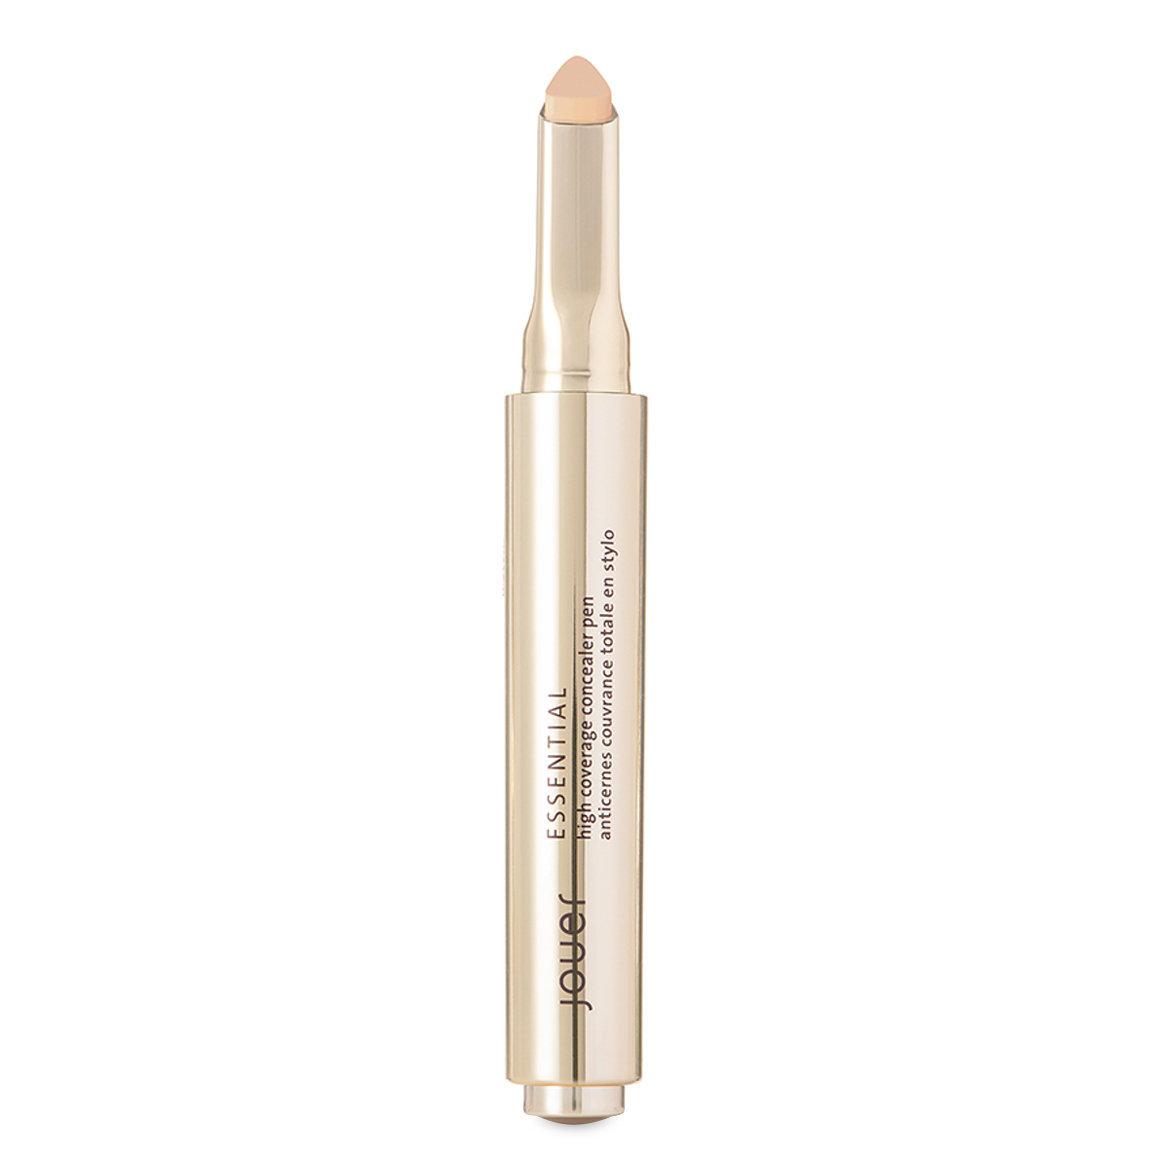 Jouer Cosmetics Essential High Coverage Concealer Pen Crème alternative view 1.